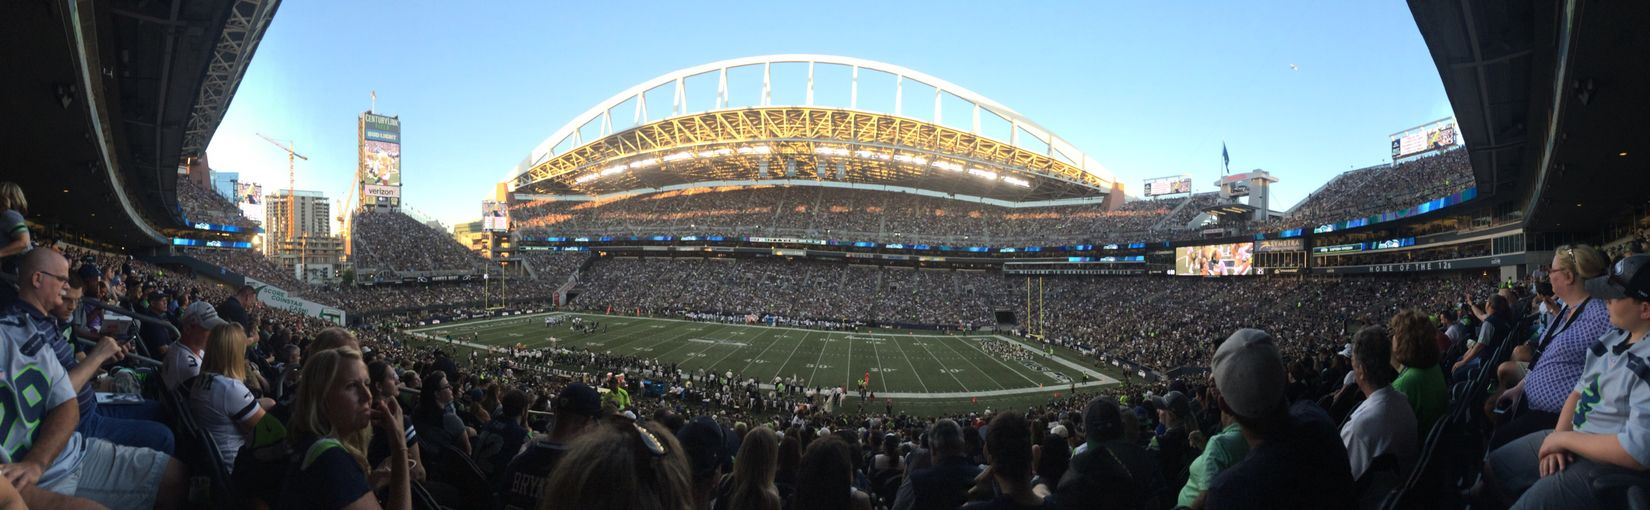 EyeEm Selects Centurylinkfield Seattle Seahawks Football NFL NFL Football